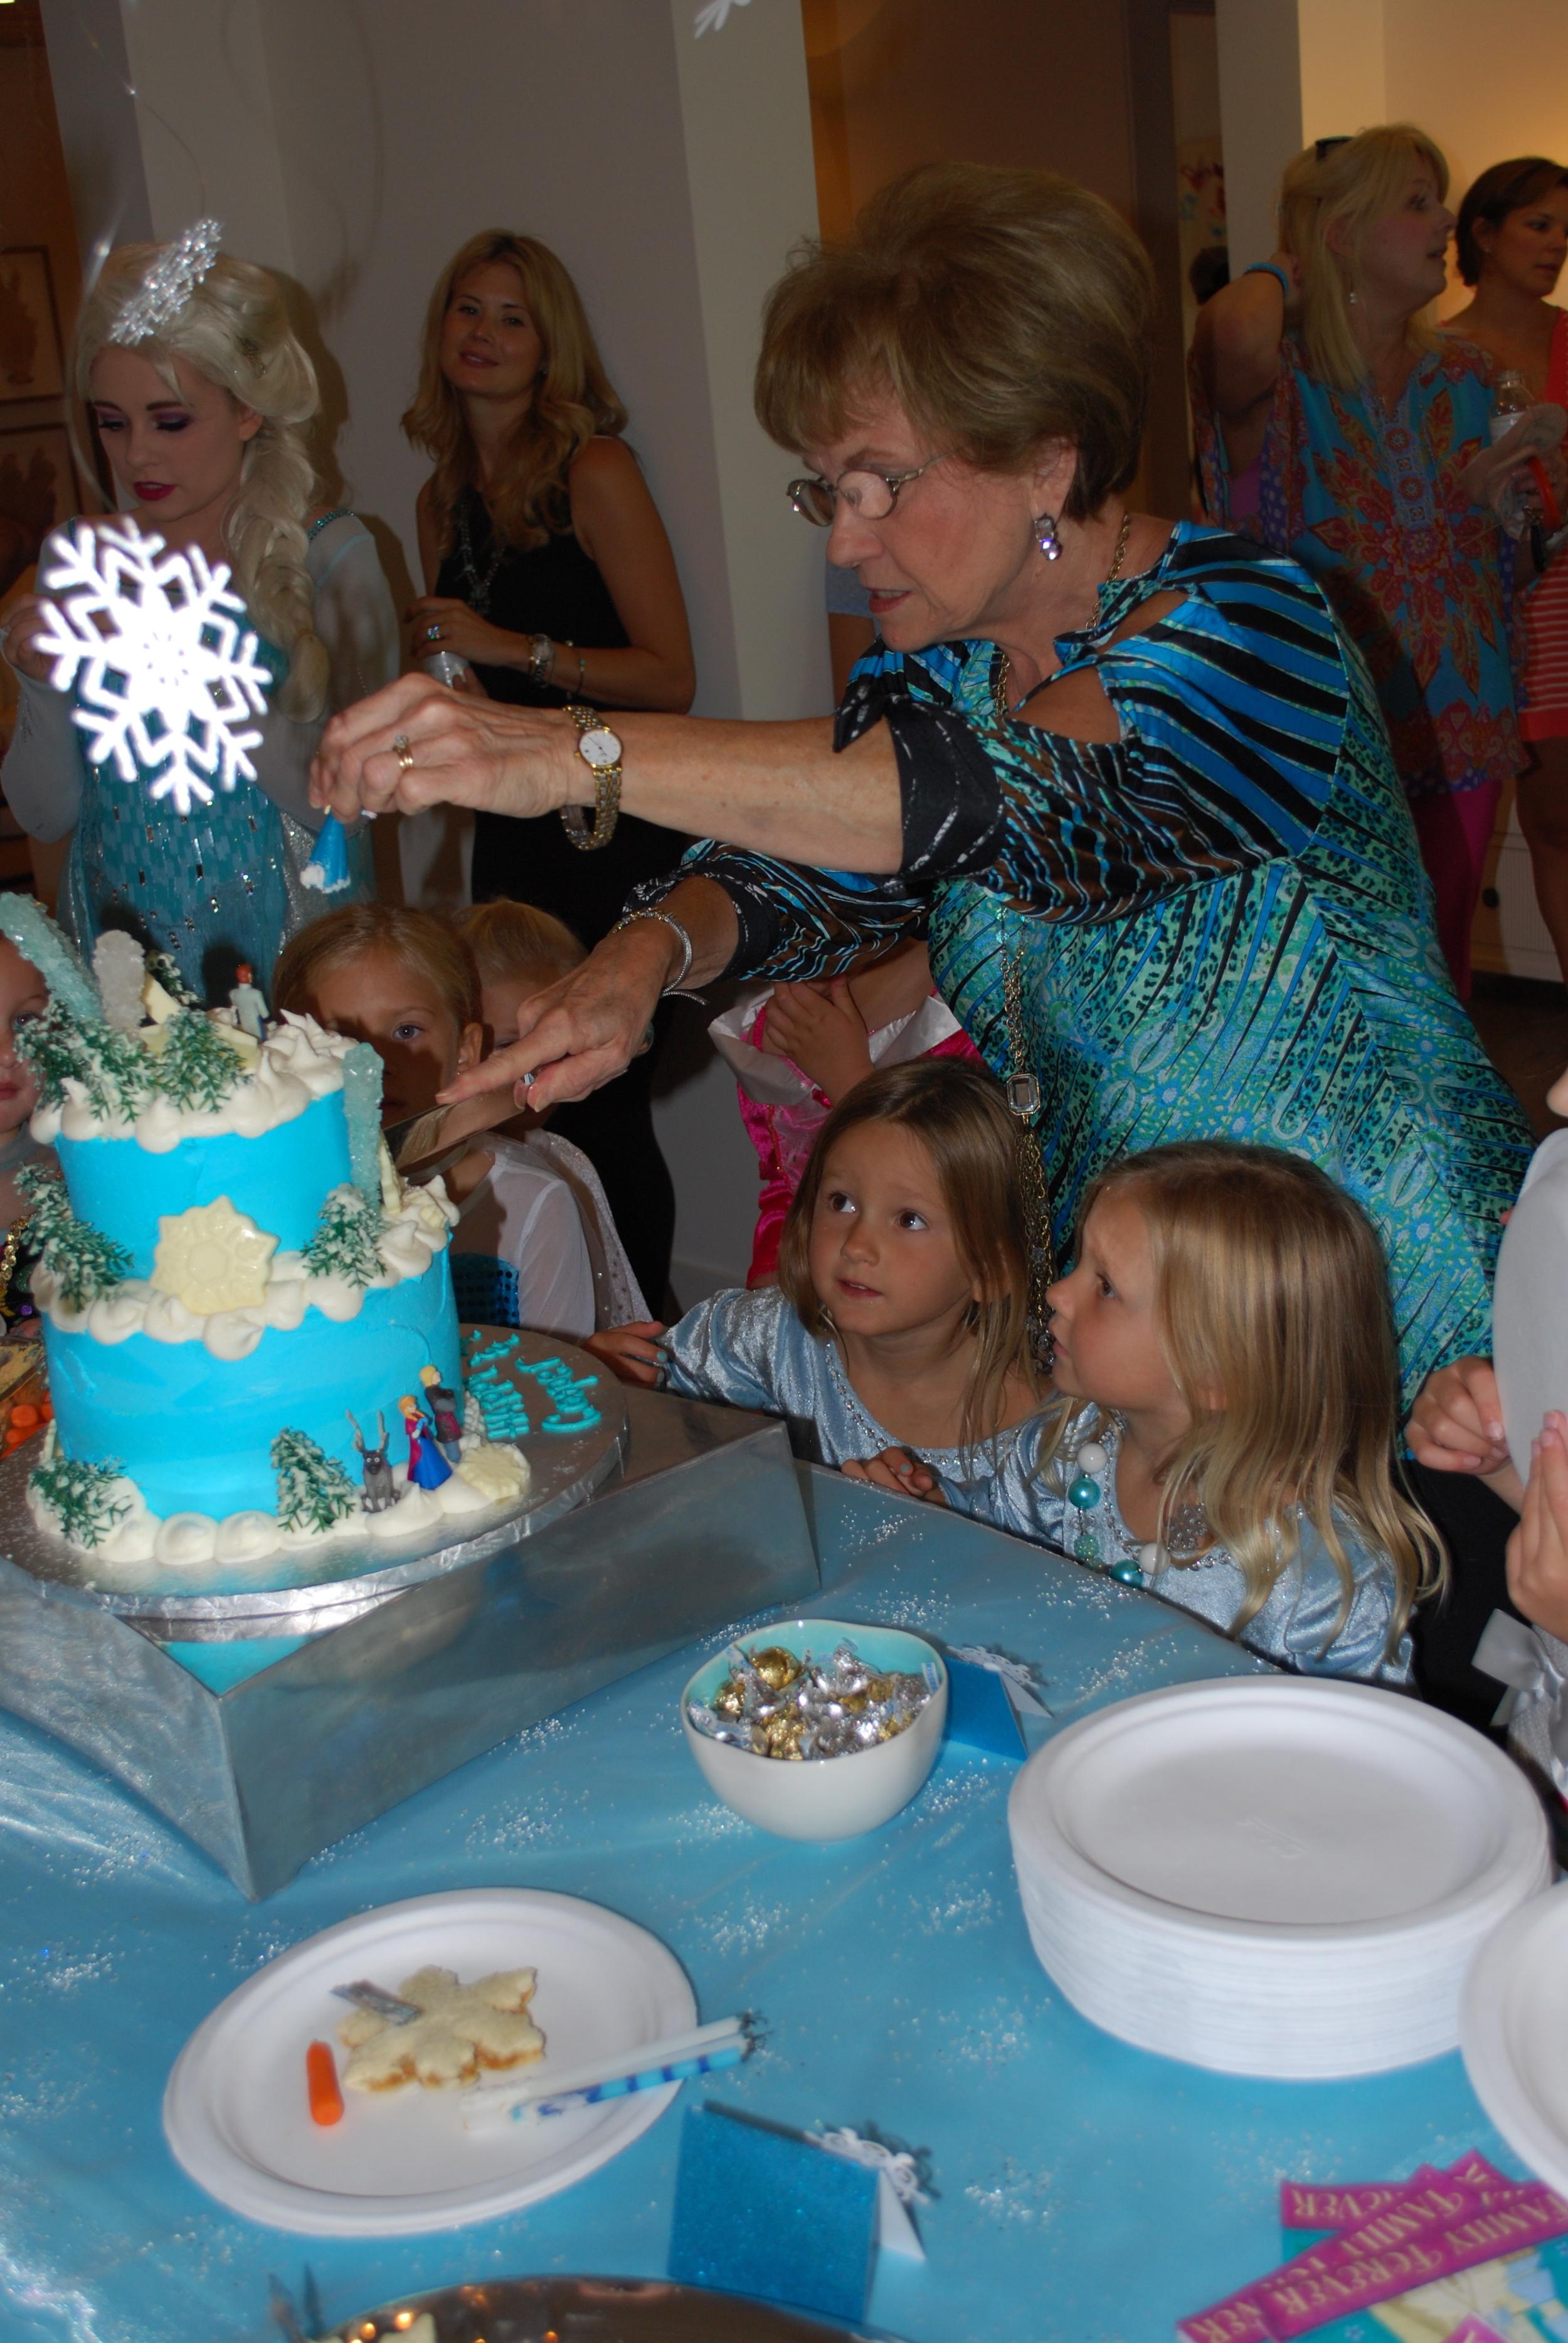 Nana cutting the cake